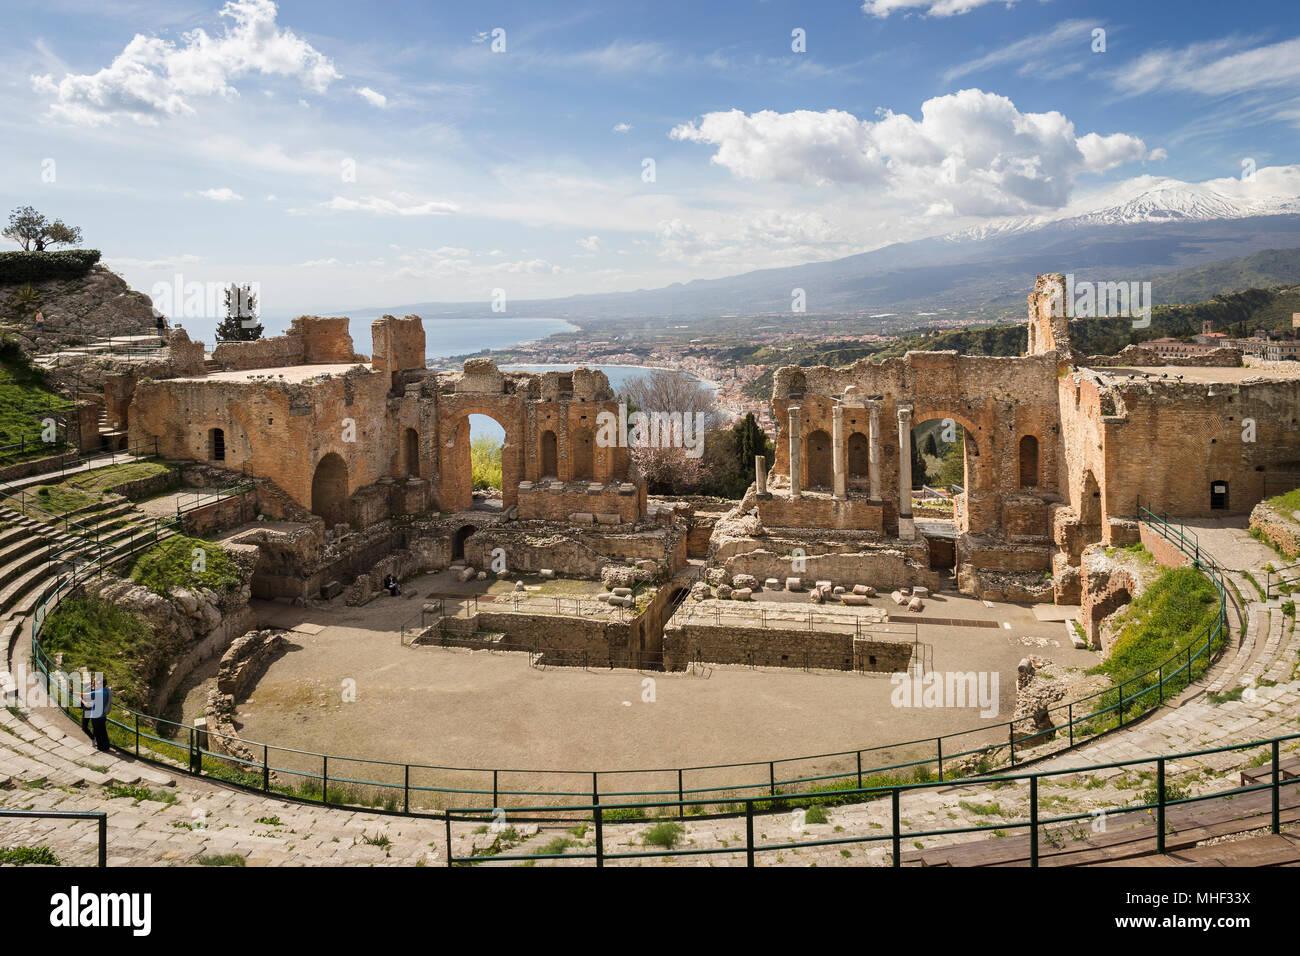 Das antike Theater von Taormina mit Mt. Ätna, Sizilien. Stockbild